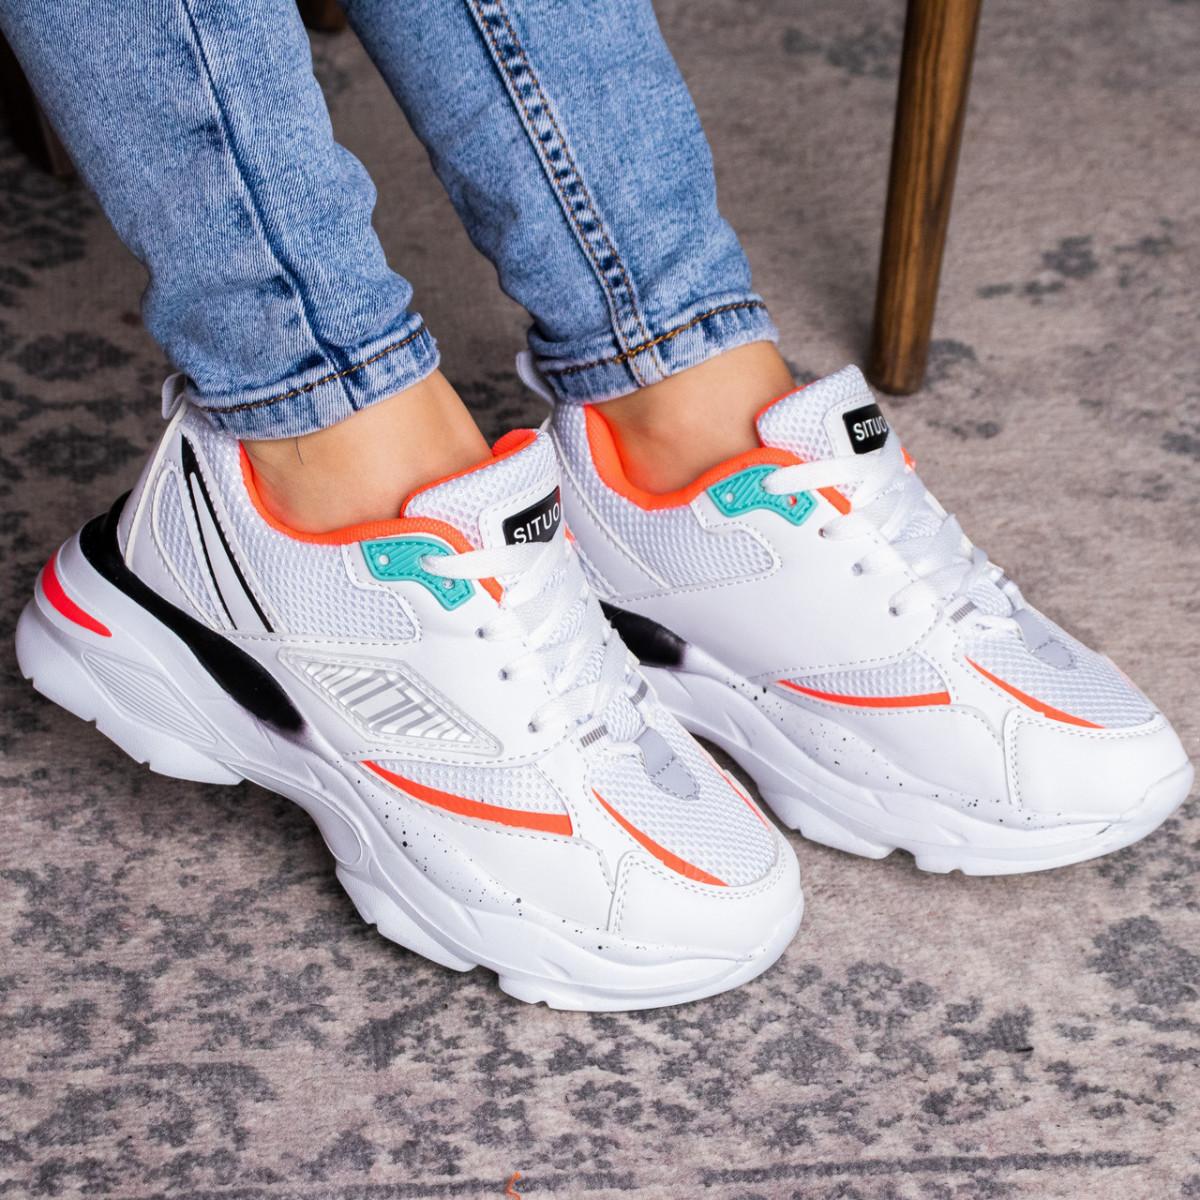 Женские кроссовки Fashion Caruso 1611 36 размер 23 см Белый